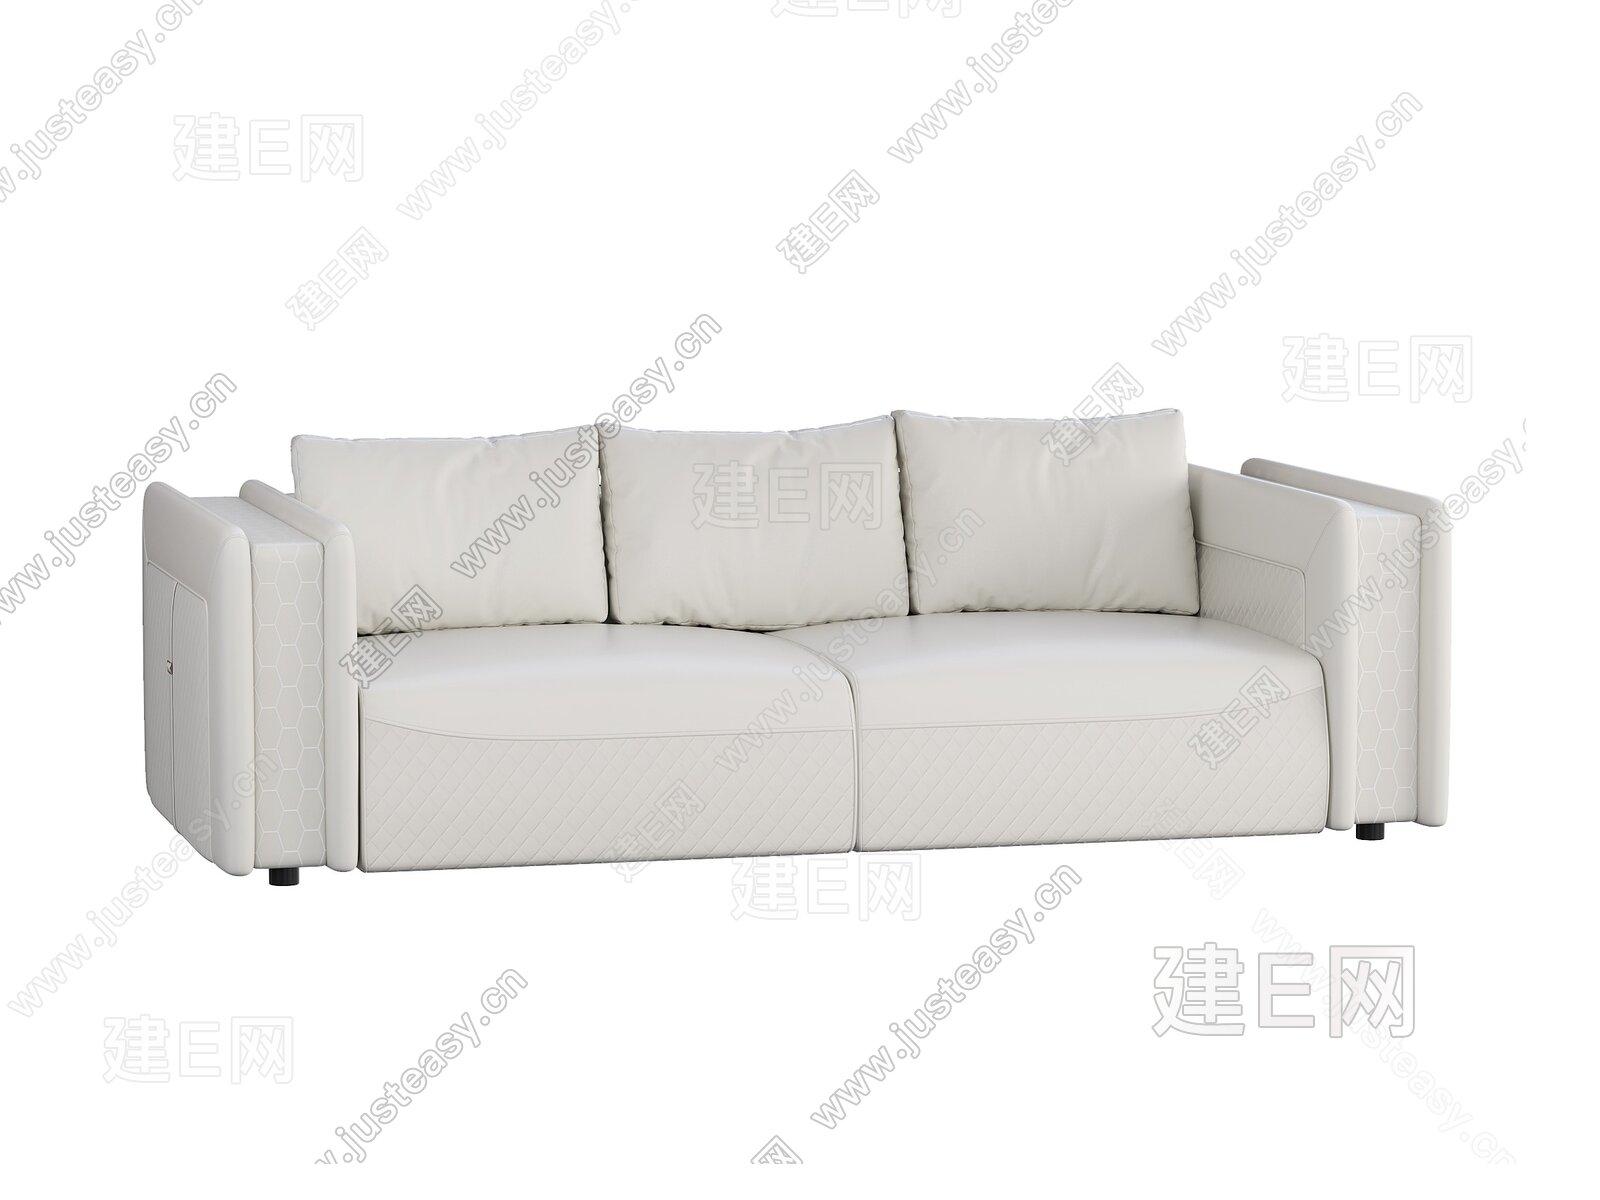 Armani 现代双人沙发3d模型